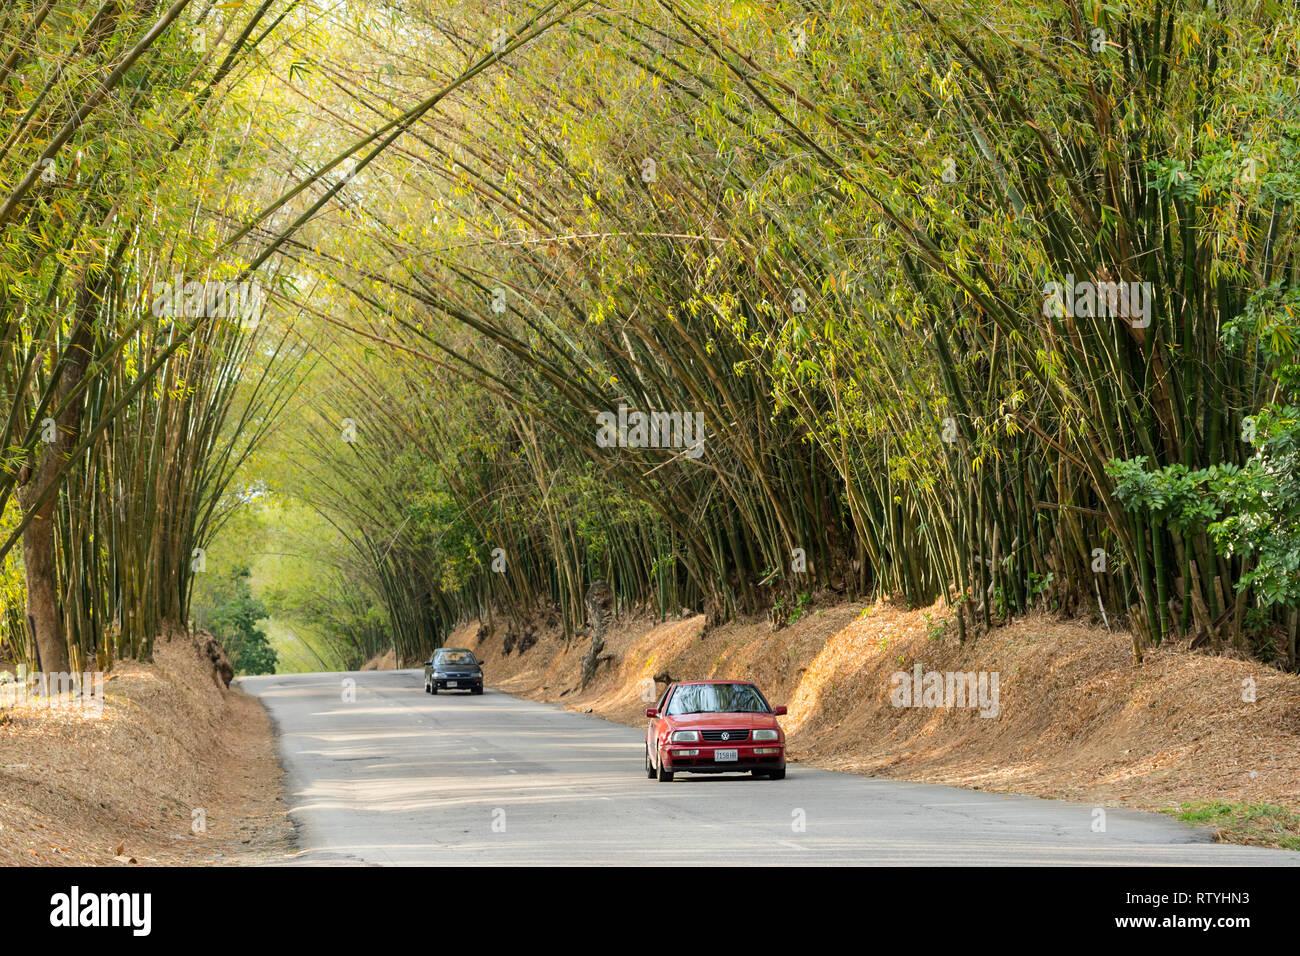 Jamaica Road Stock Photos Amp Jamaica Road Stock Images Alamy